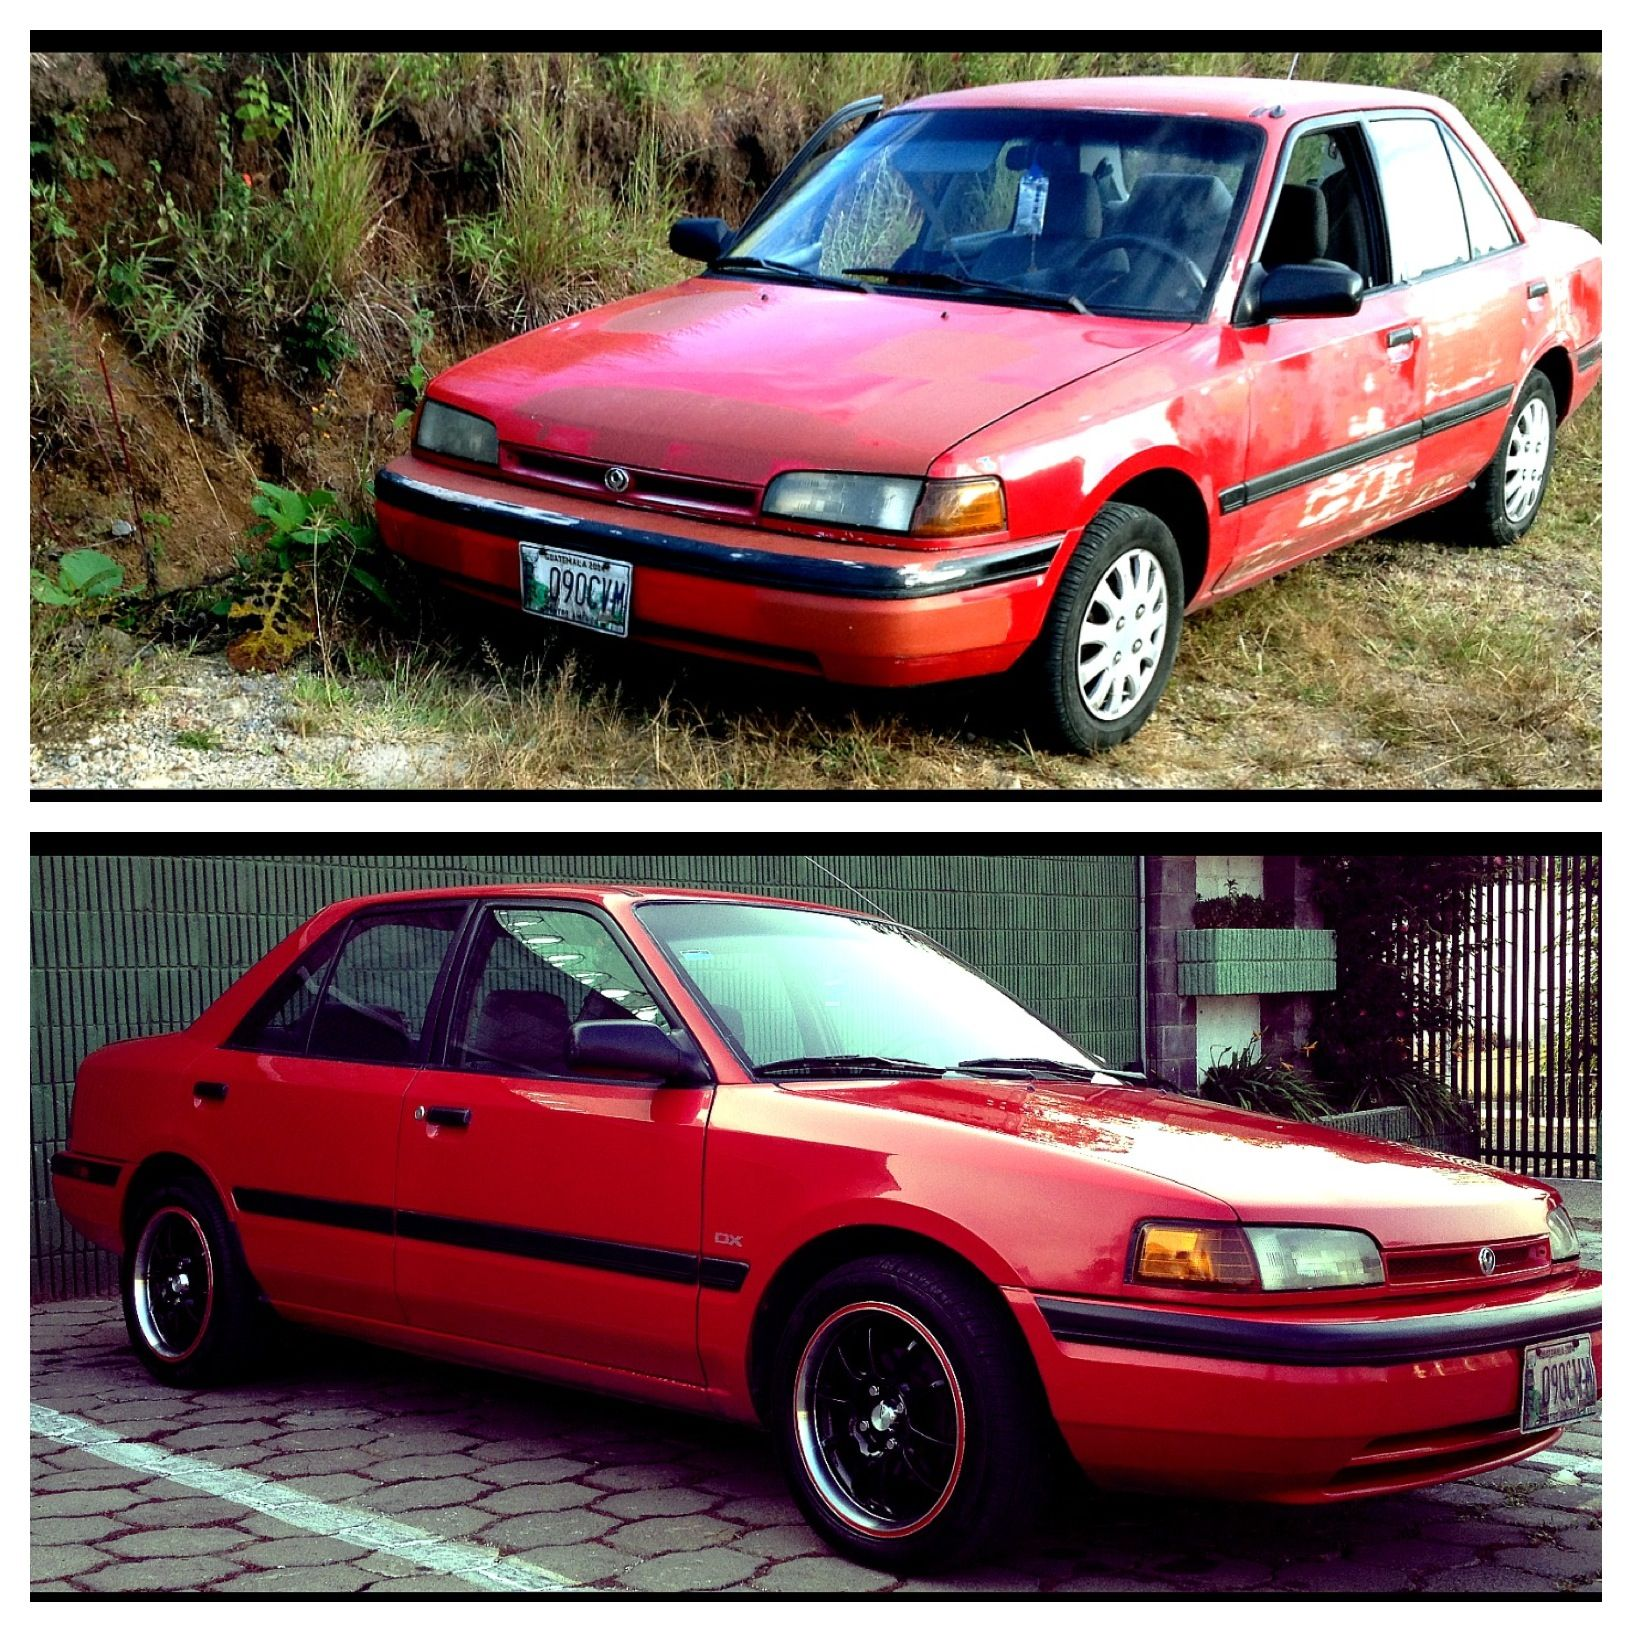 Mazda protege 1994 1800 cc